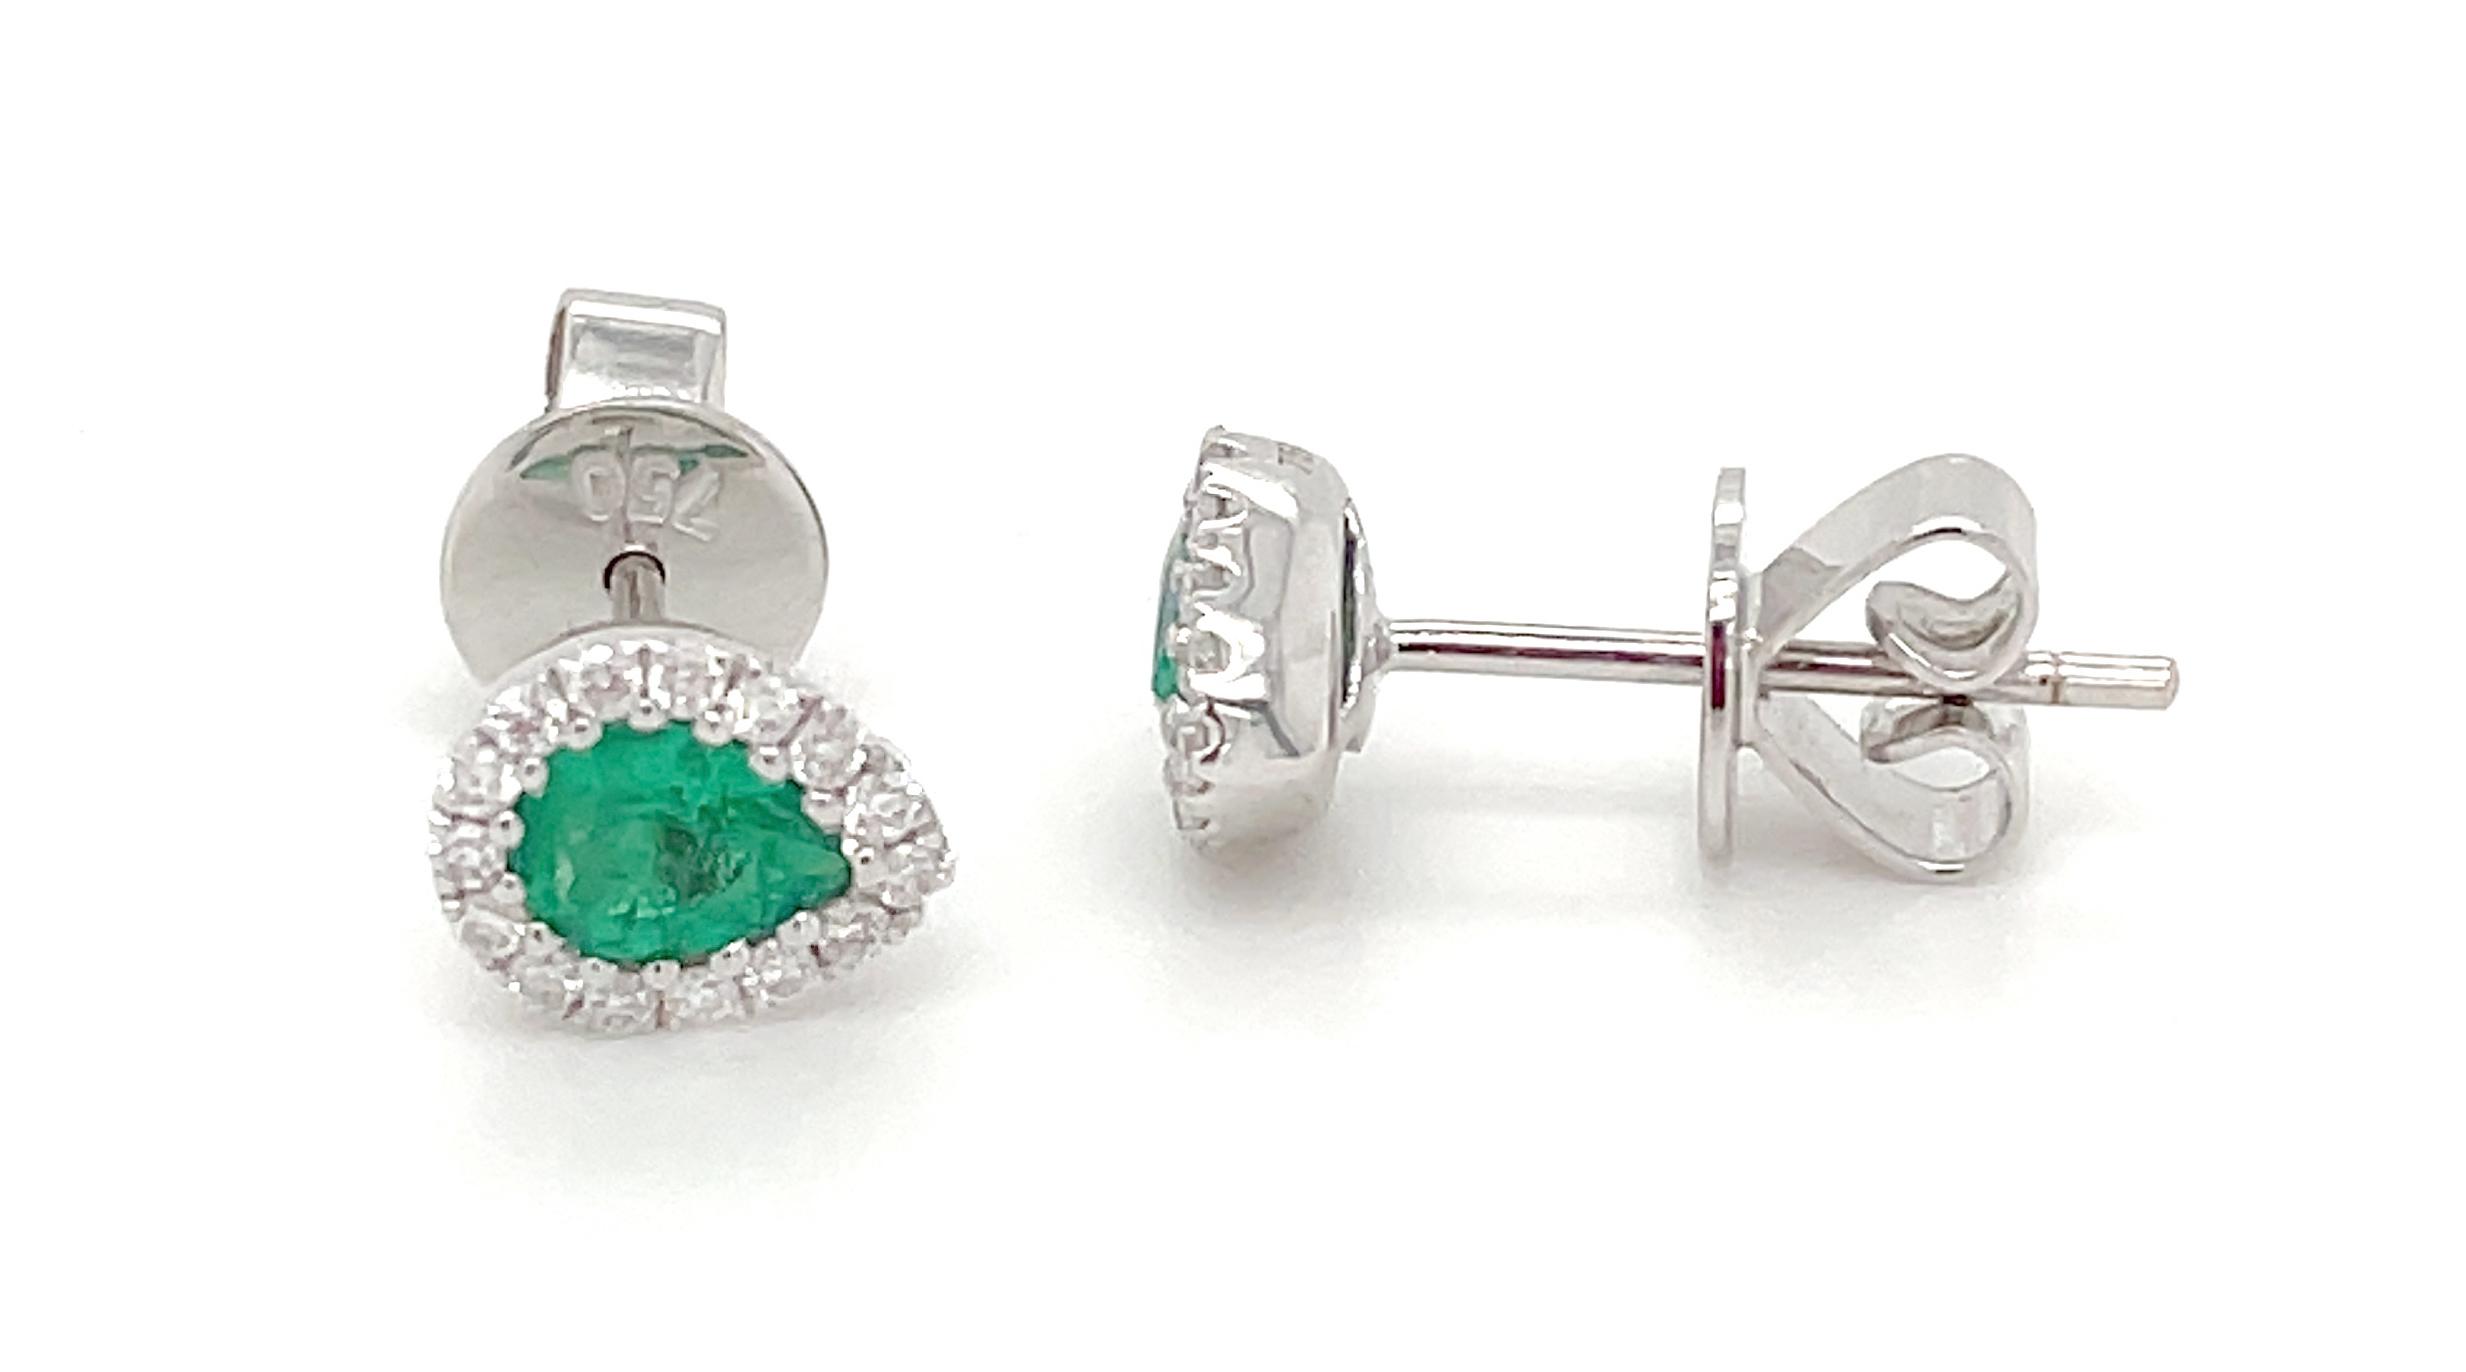 18k White Gold Pearshape Emerald & Brilliant Cut Diamond Cluster Stud Earrings